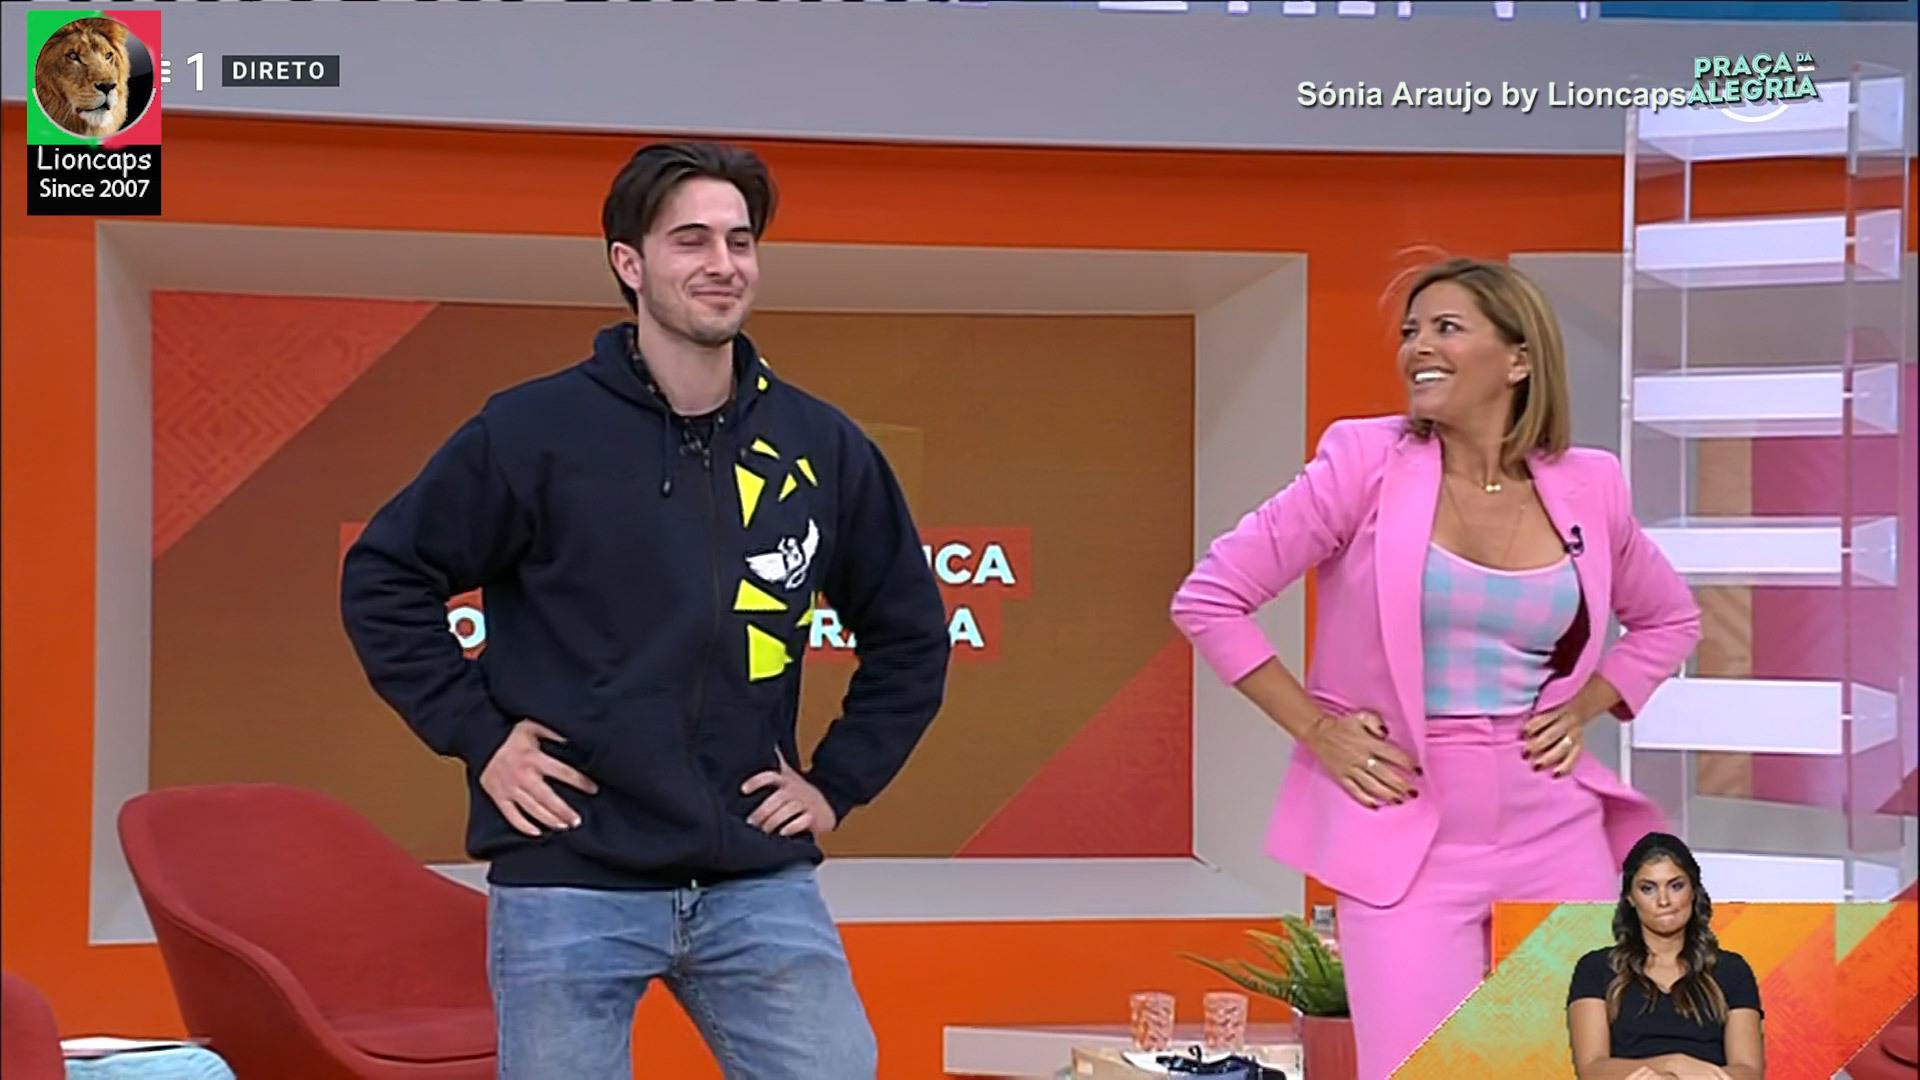 sonia_araujo_praca_lioncaps_11_04_2021 (15).jpg